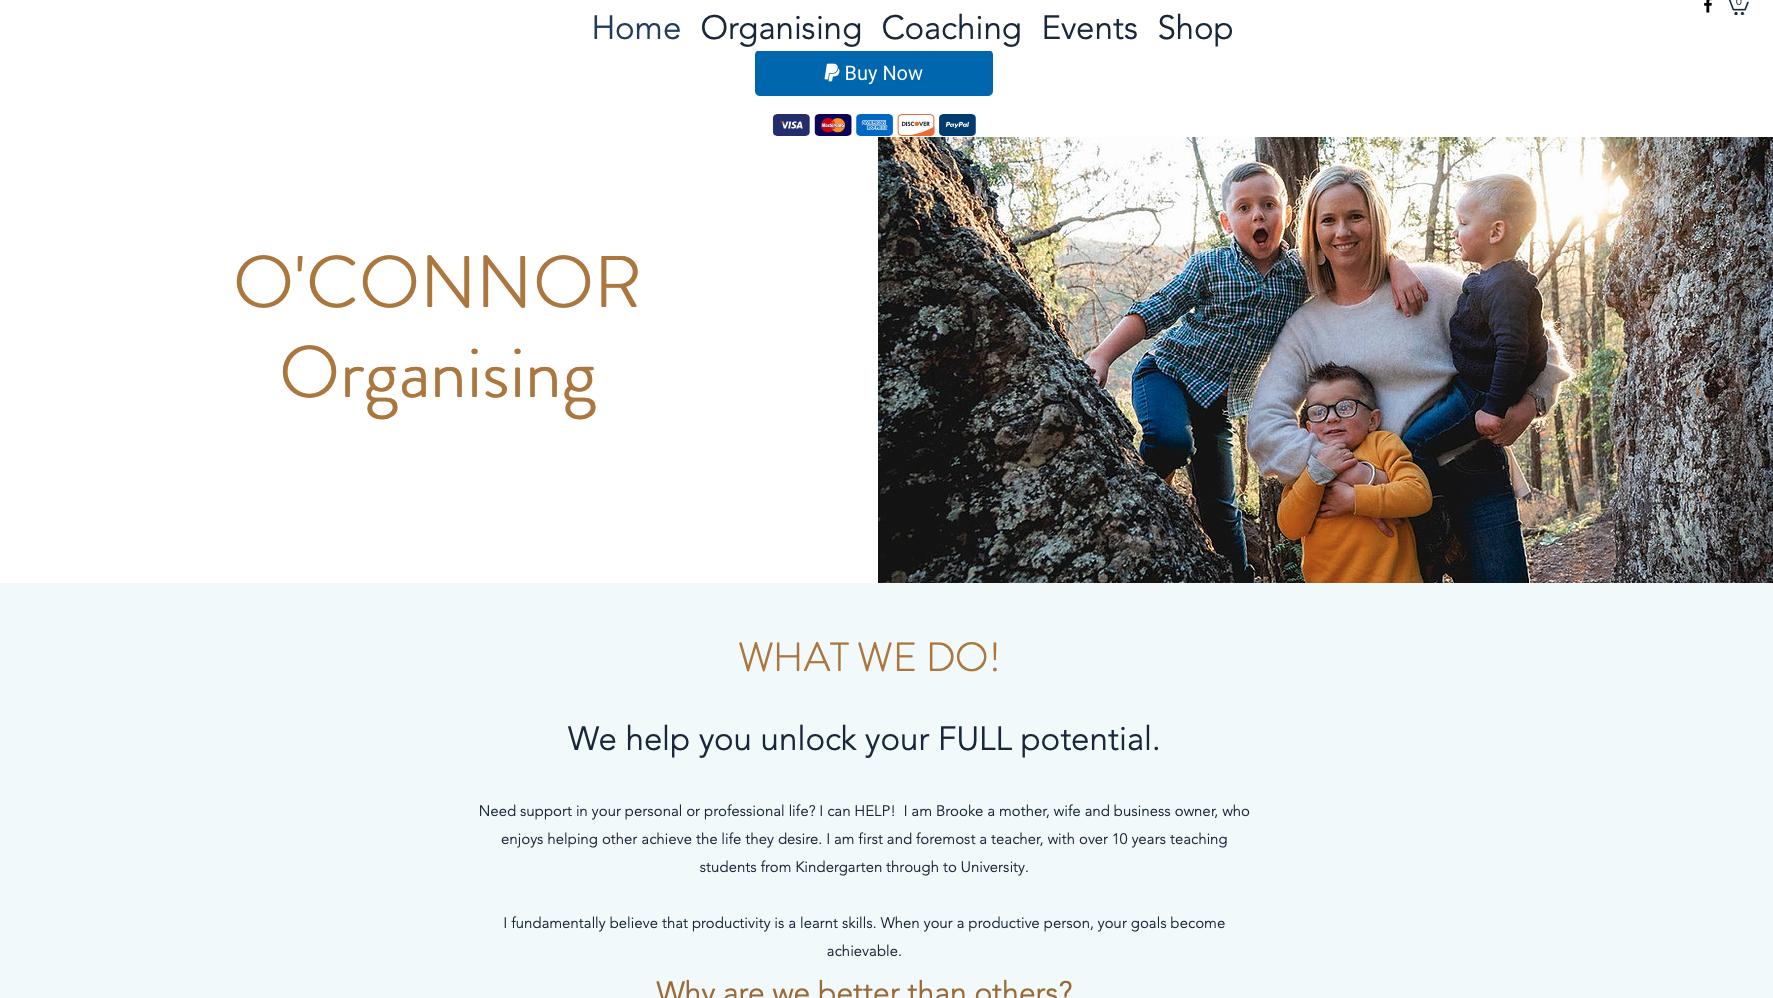 O'Connor Organising